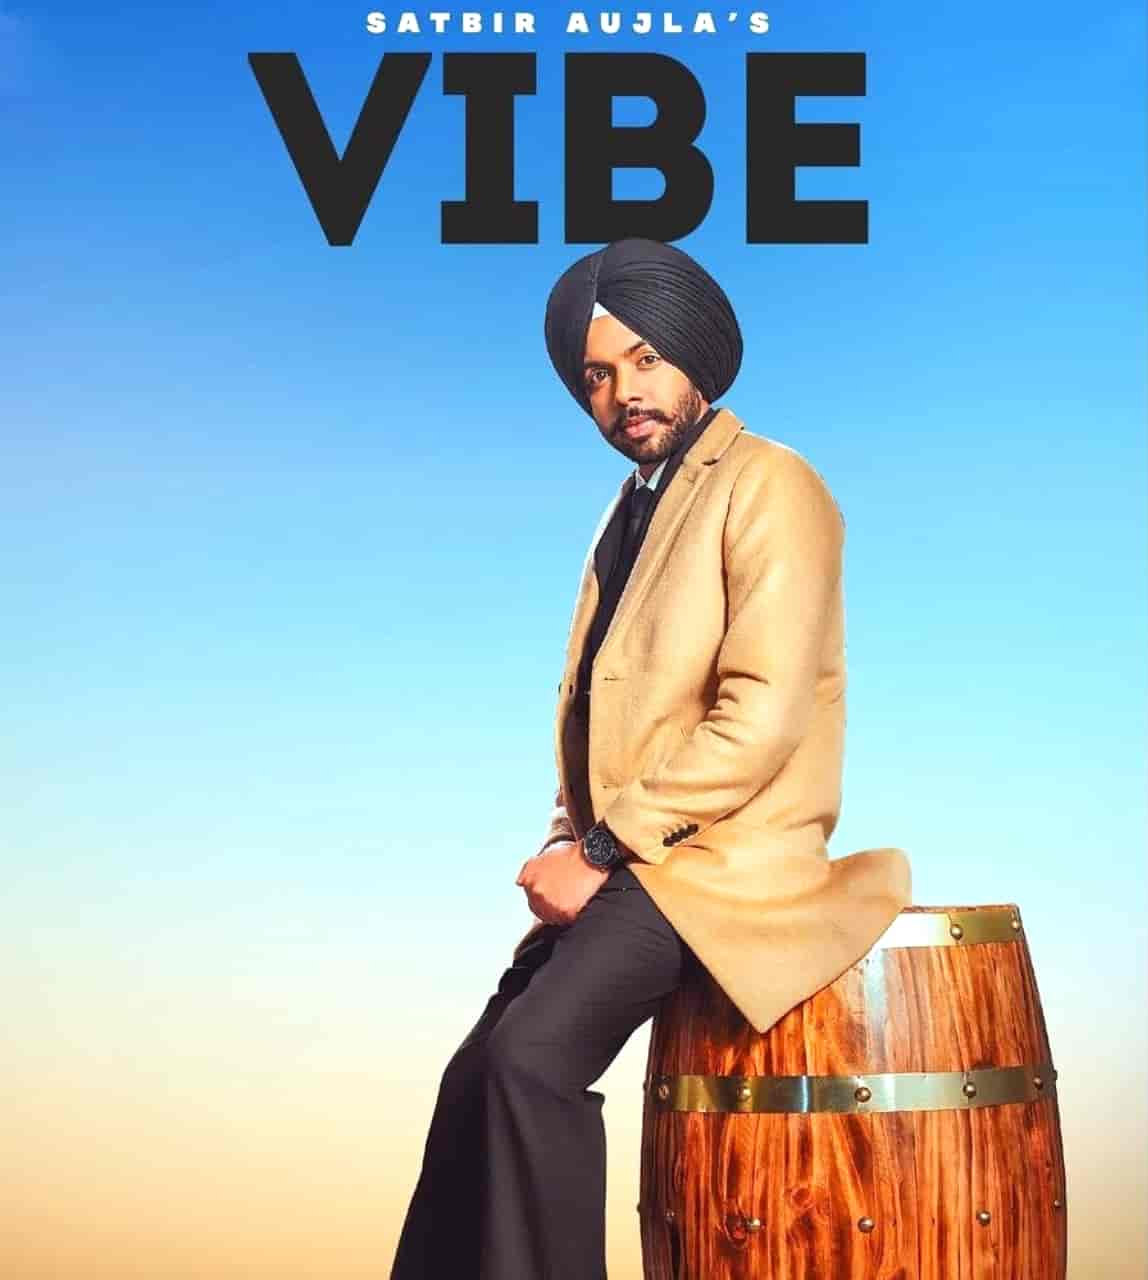 Vibe Punjabi Song Lyrics Satbir Aujla